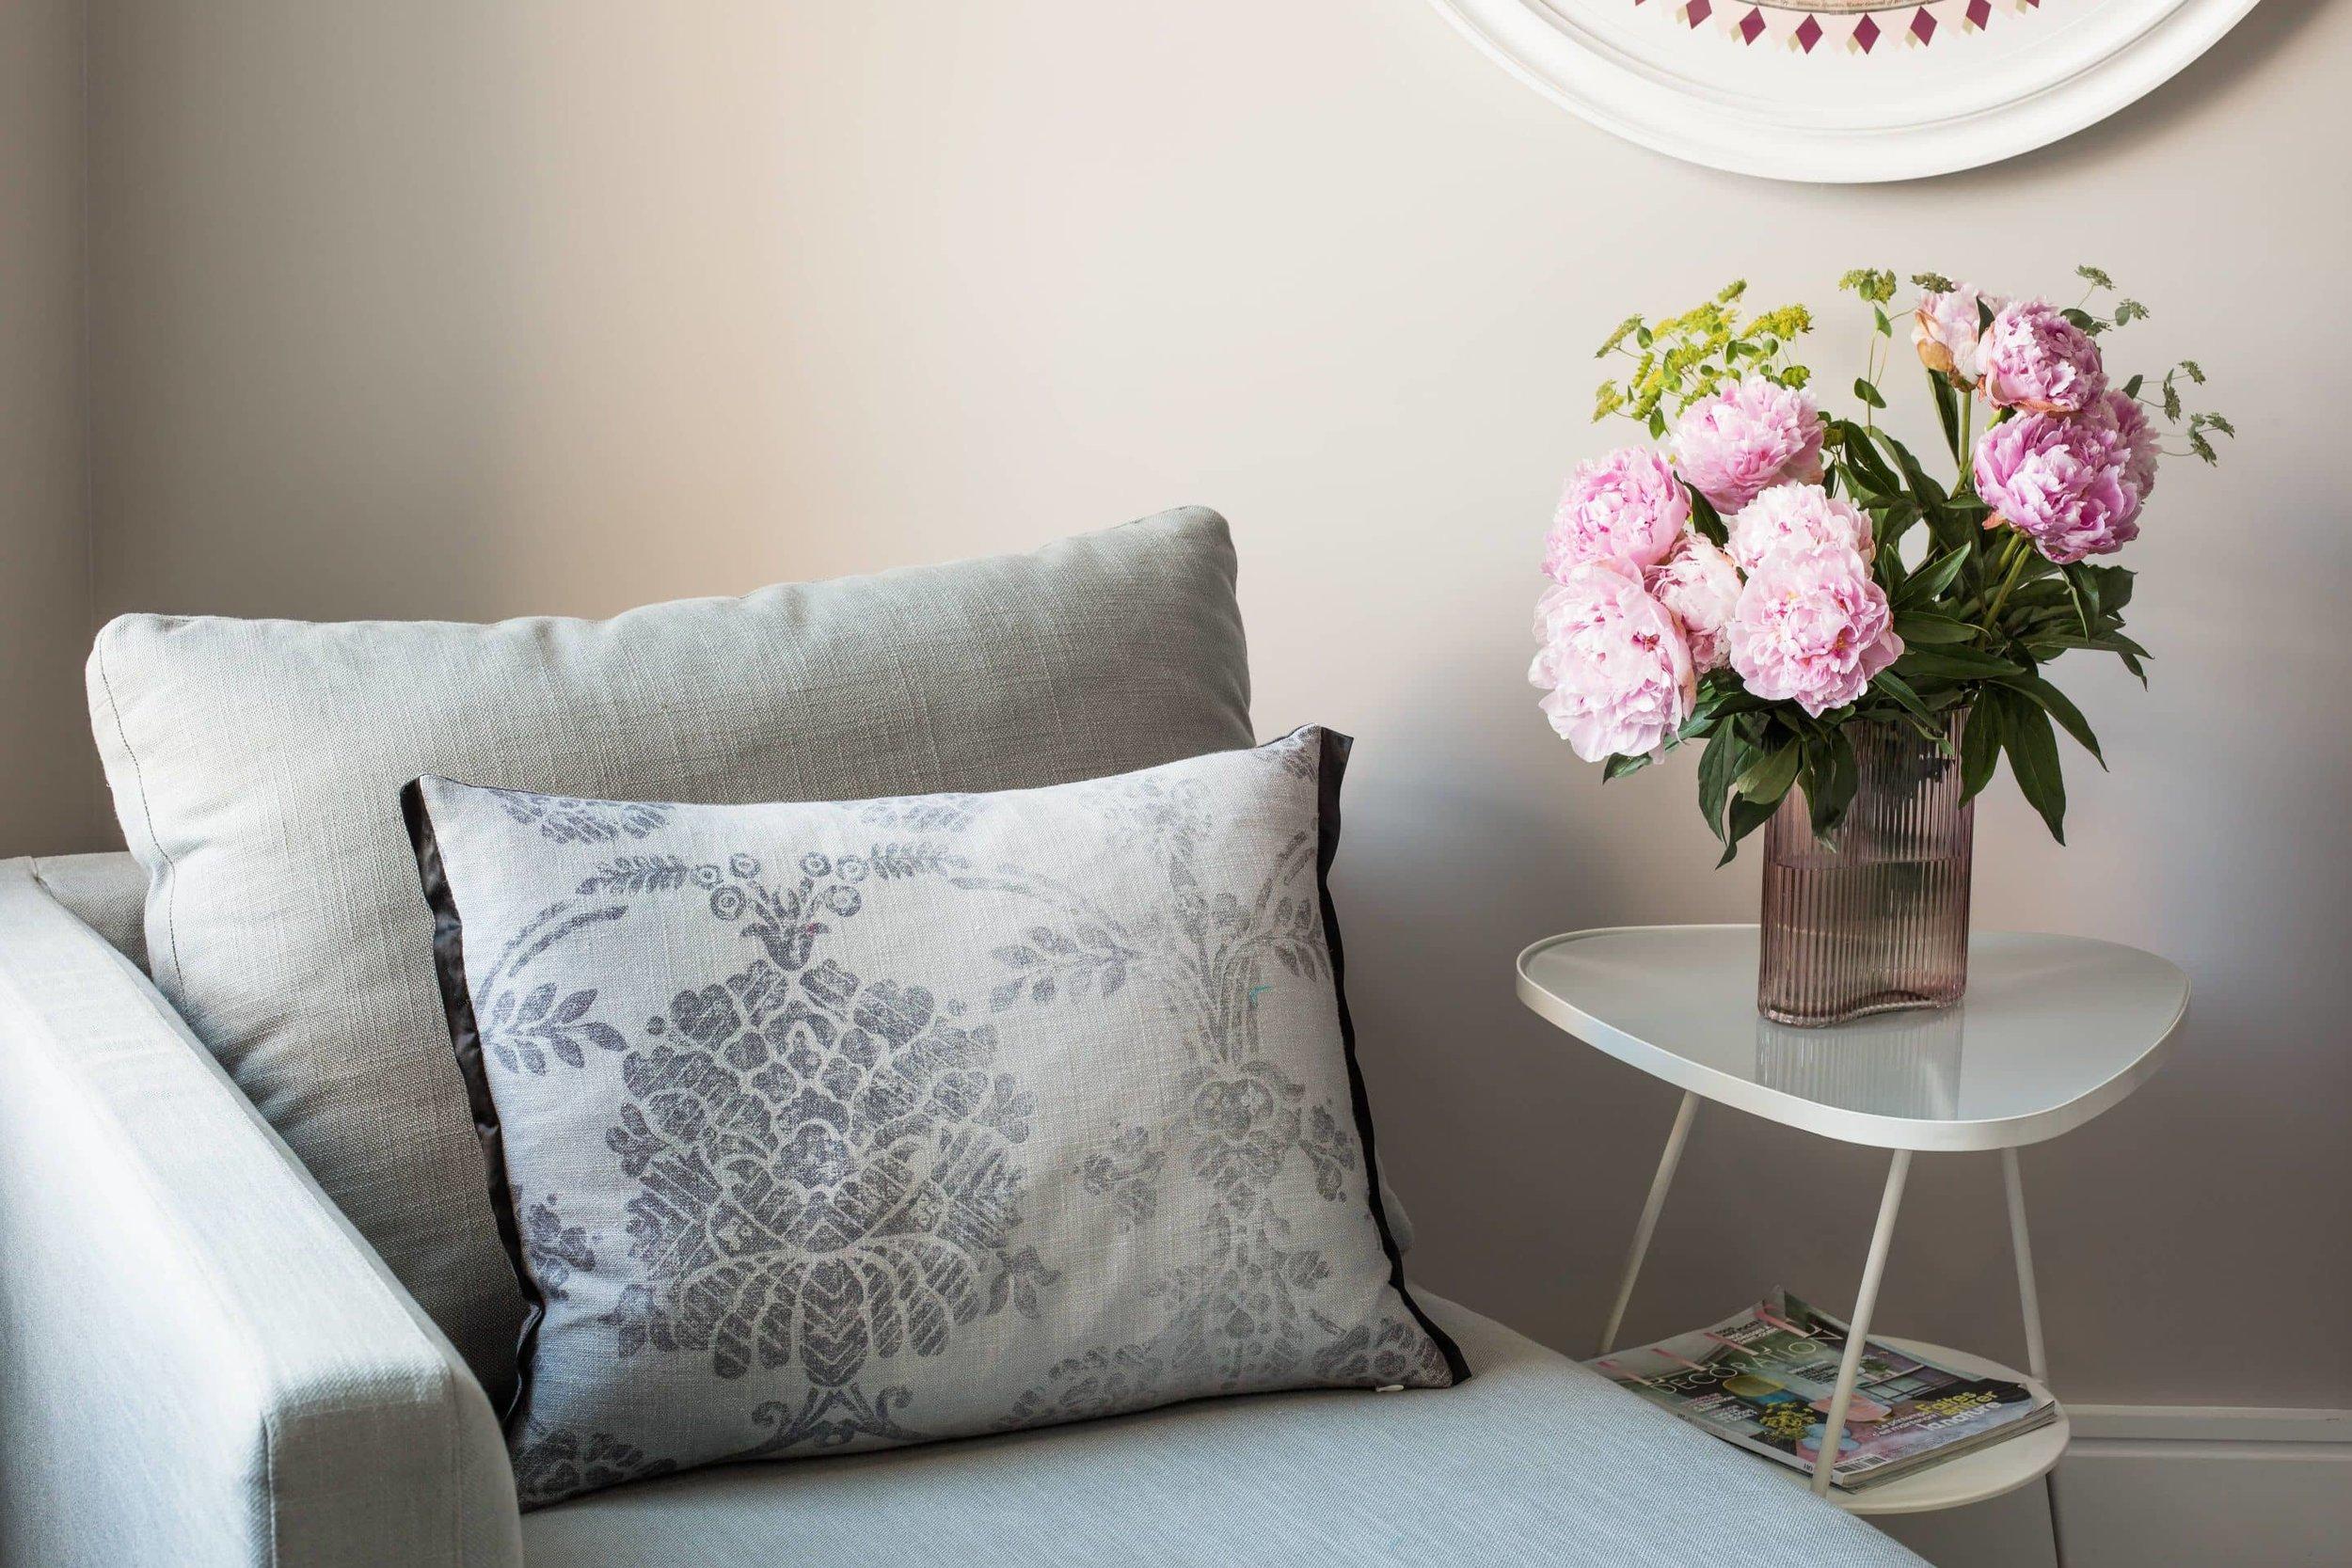 Fulham-Master-Bedroom-Suite-Refurbishment-London-12.jpg